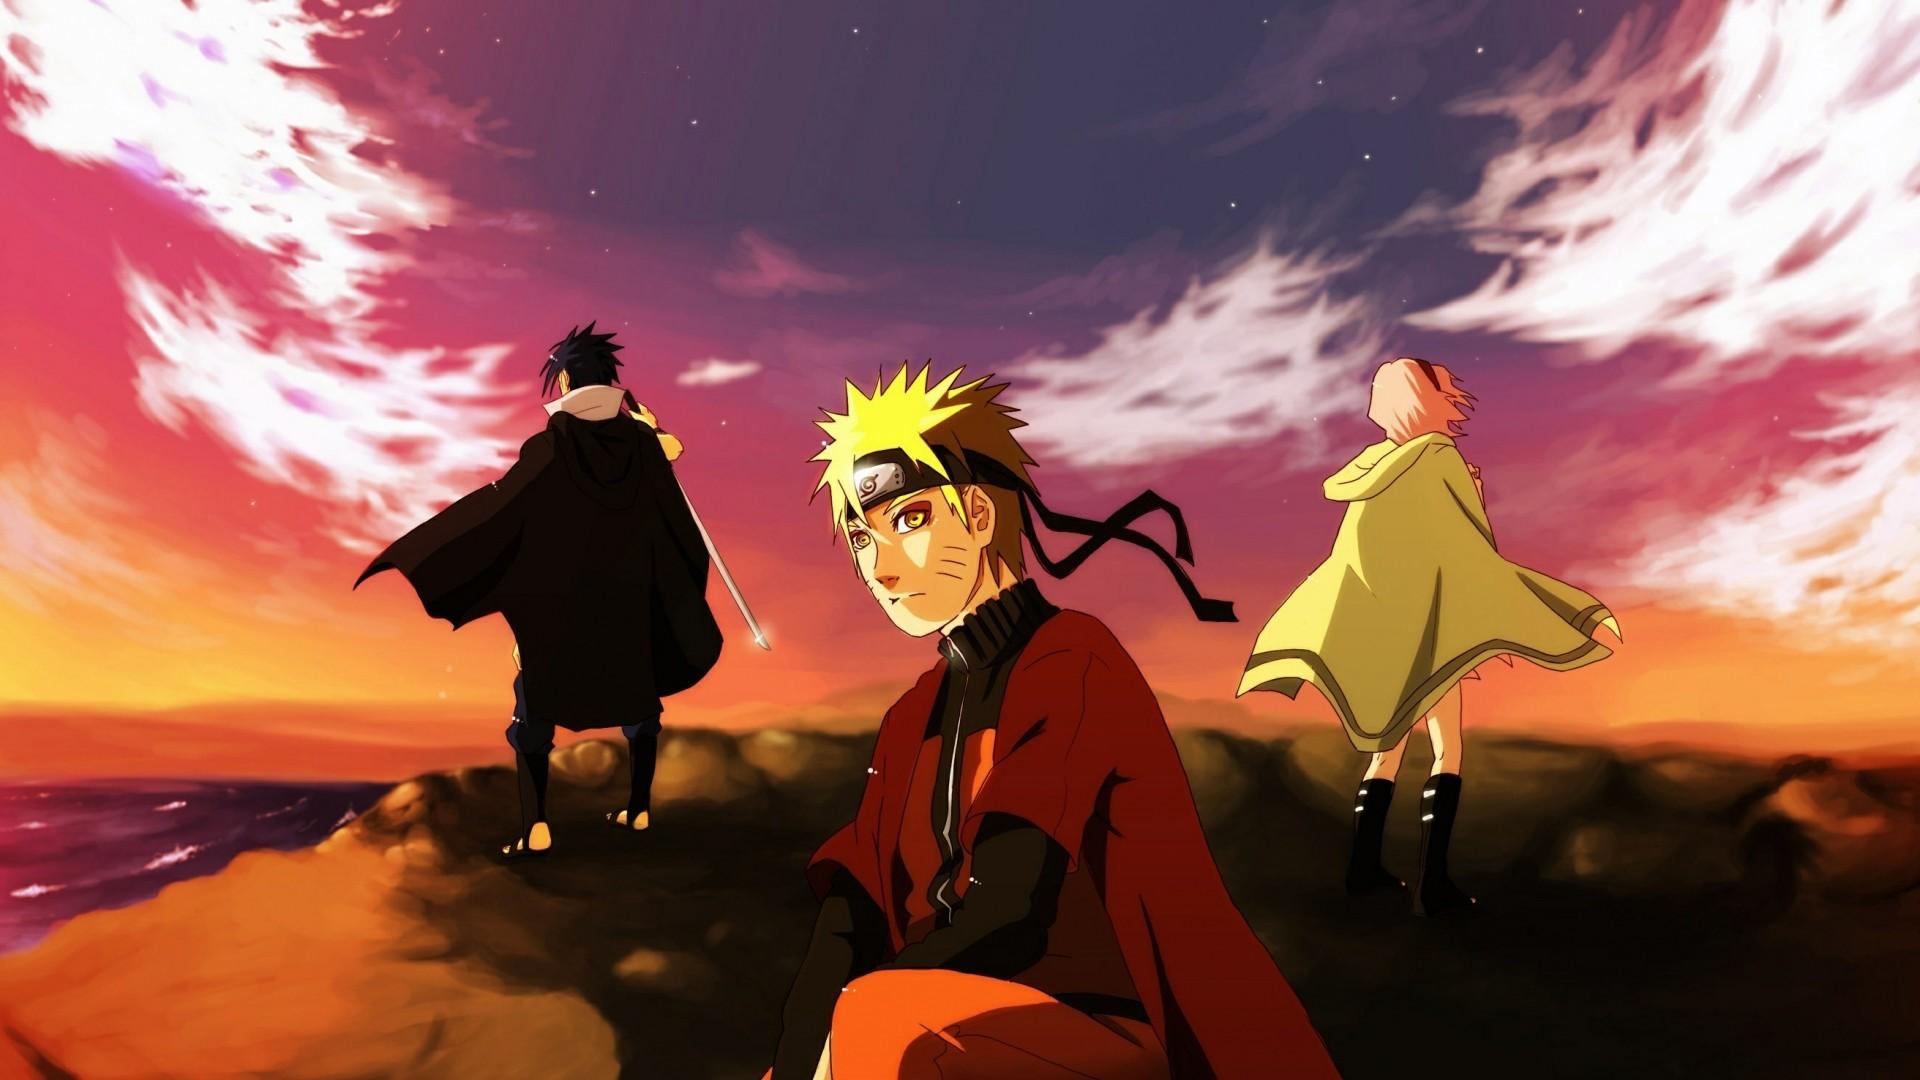 Wallpaper naruto, team of seven, uchiha sasuke, art, sea, cliff